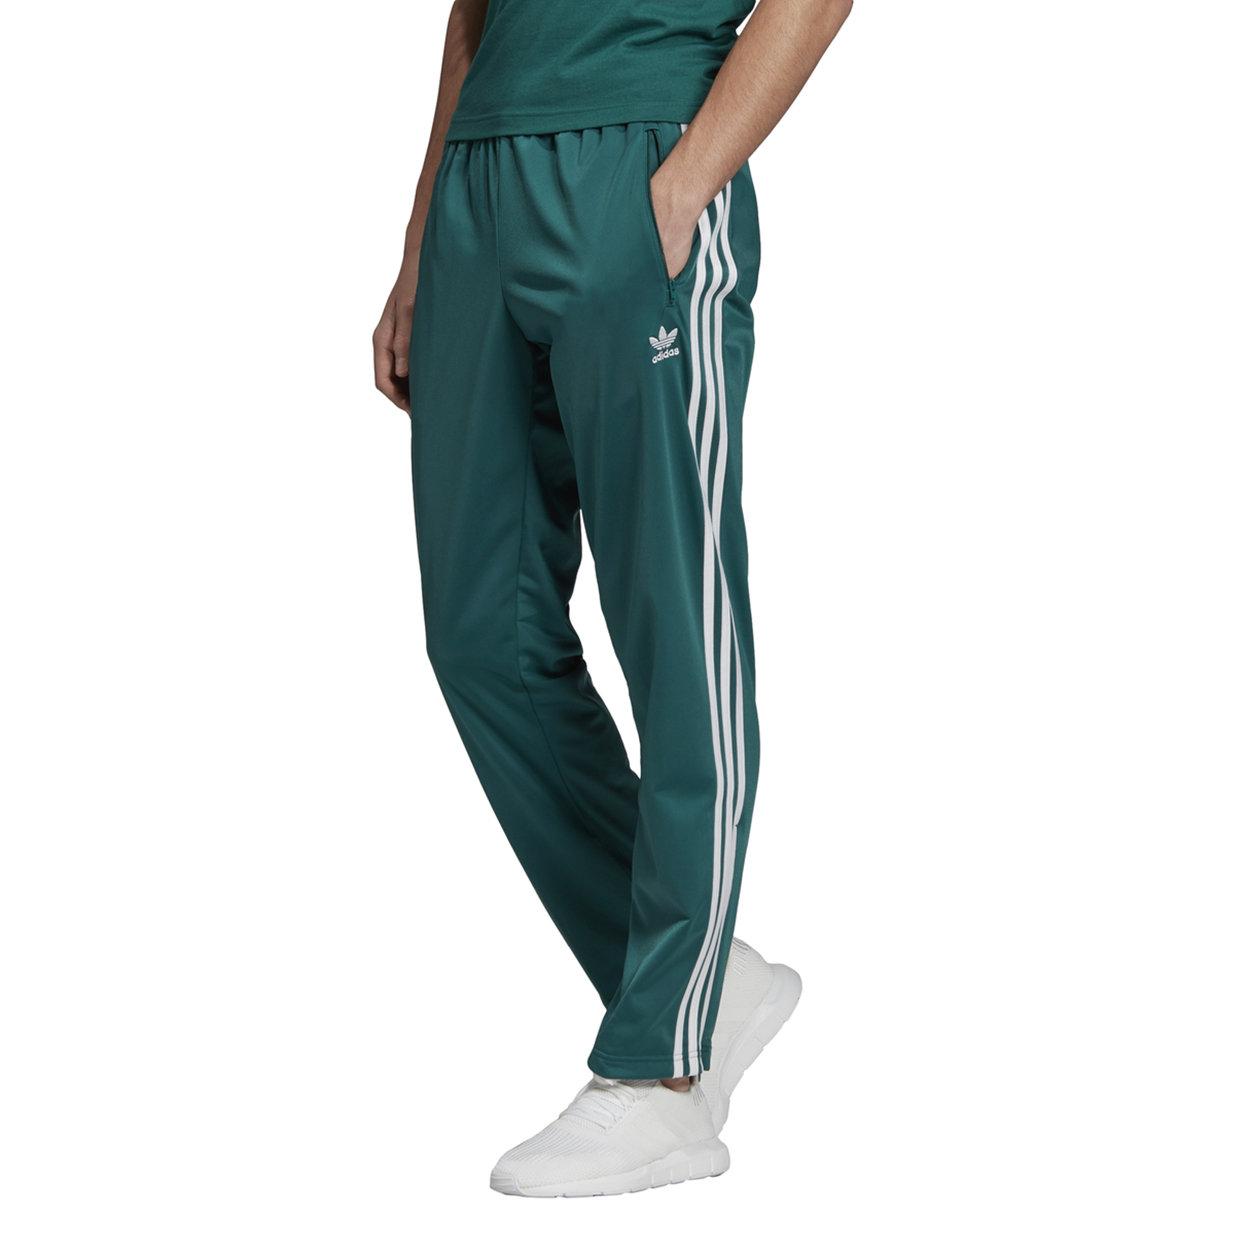 adidas pantaloni donna verdi